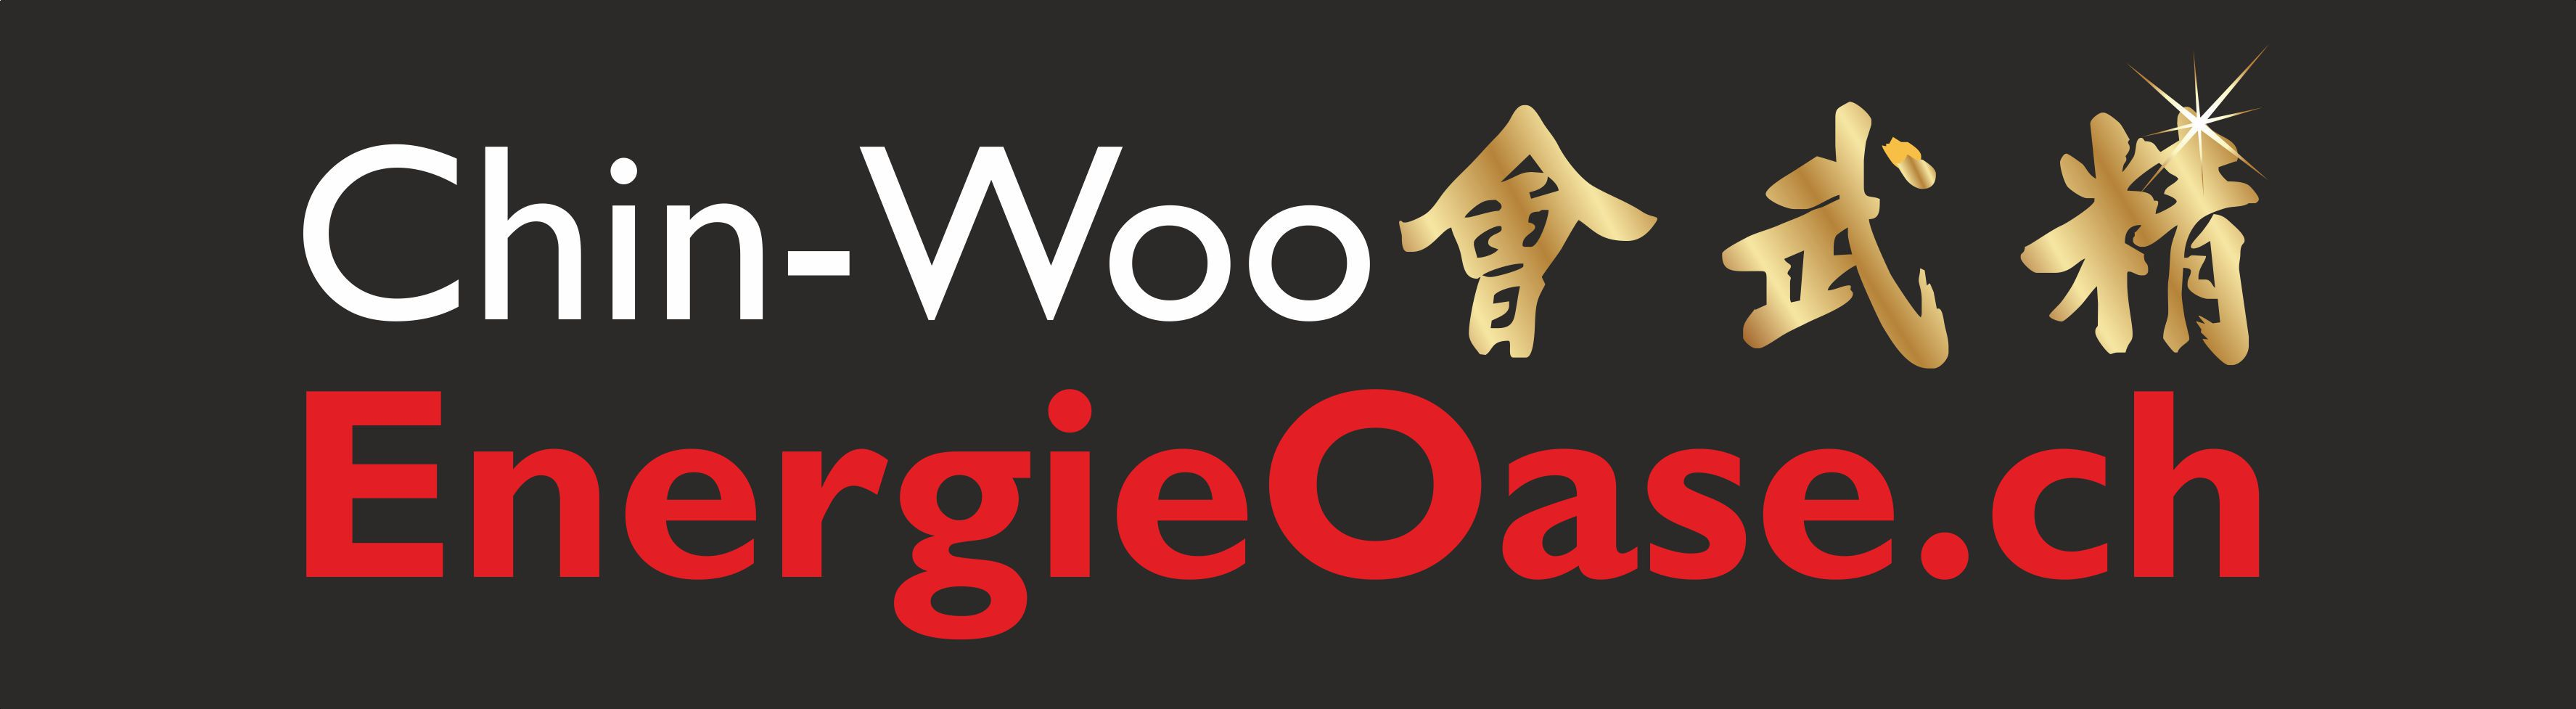 EnergieOase & Chin-Woo